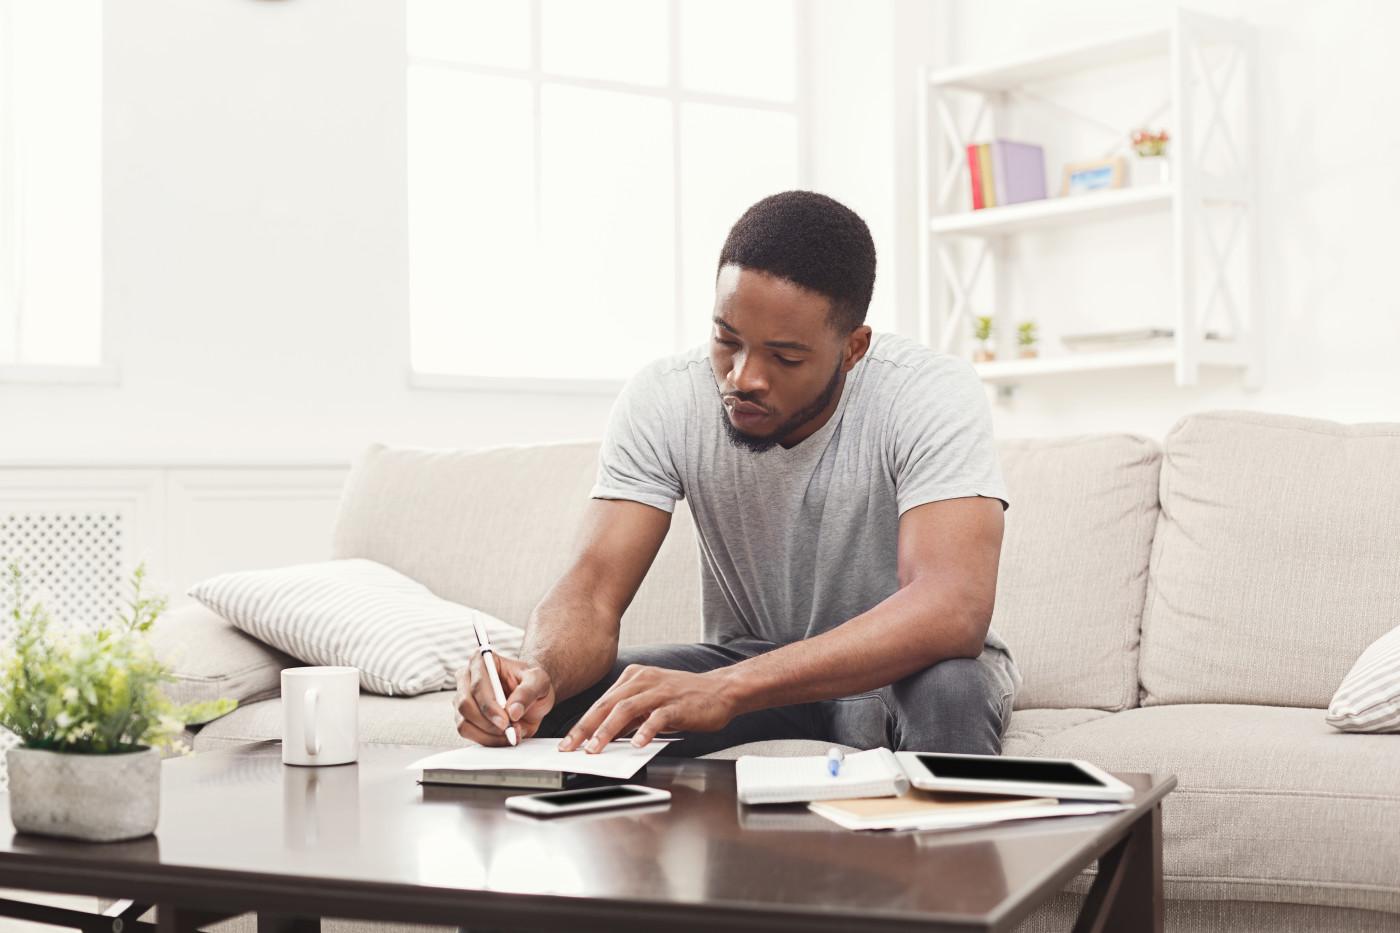 man arranging student debt papers